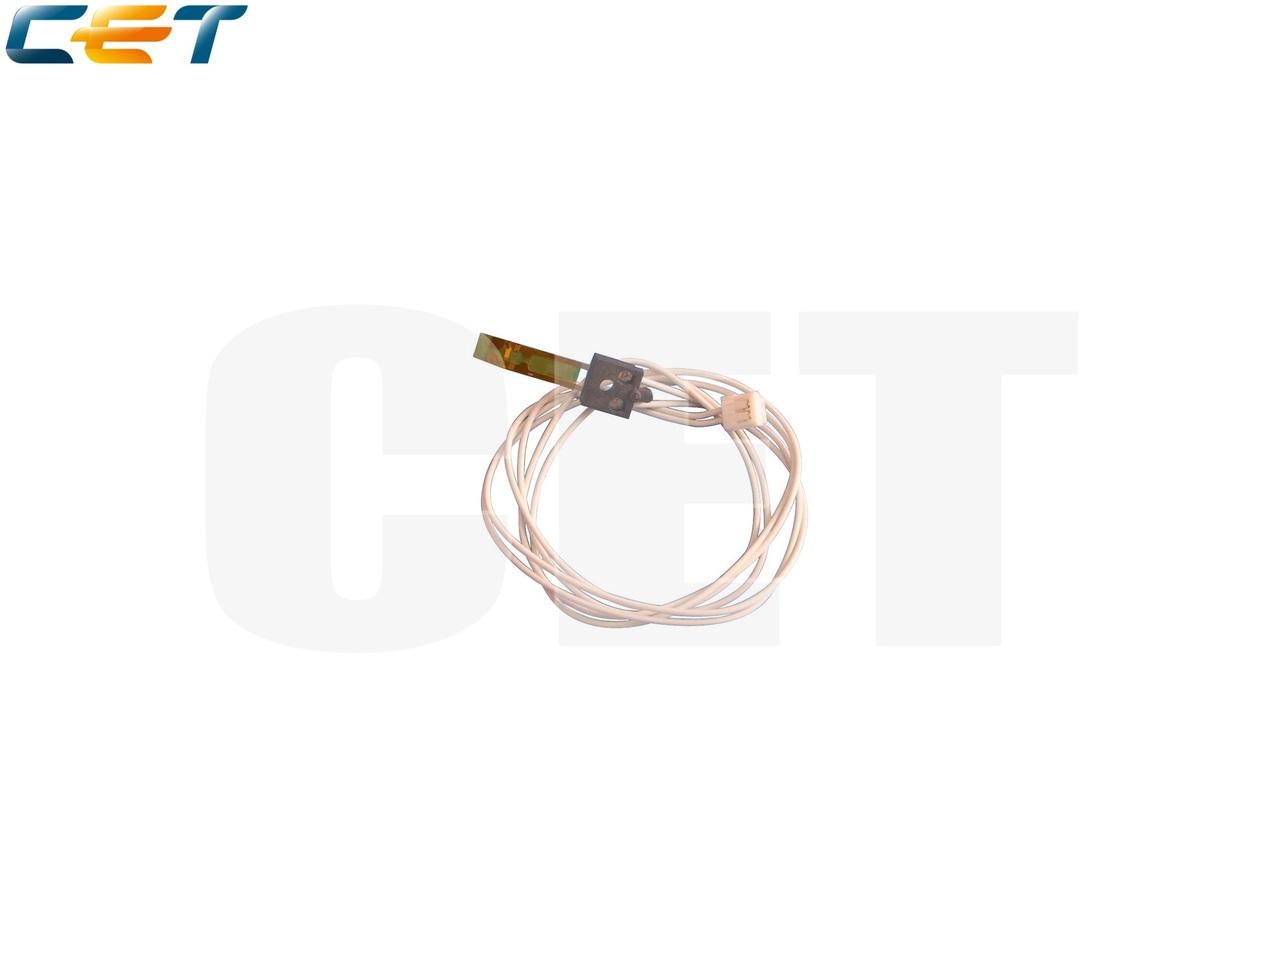 Термистор-1 LJ1345001 для BROTHERHL-5240/5250/5340/5350/5370, DCP-8060/8080 (CET), CET3558